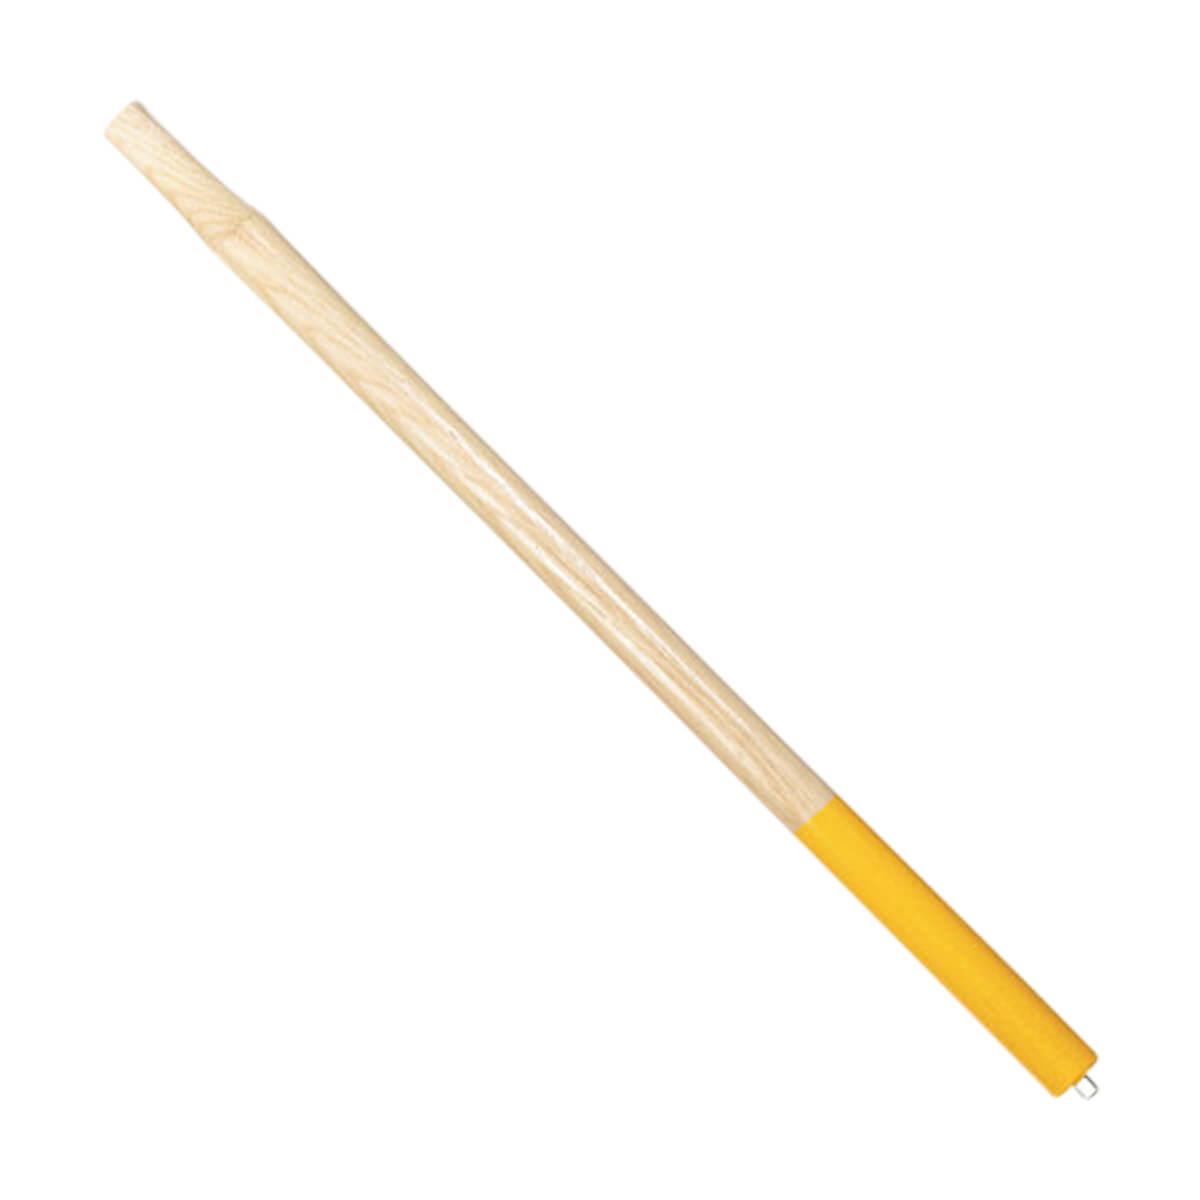 Garant Sledge Hammer Handle - 32'' long